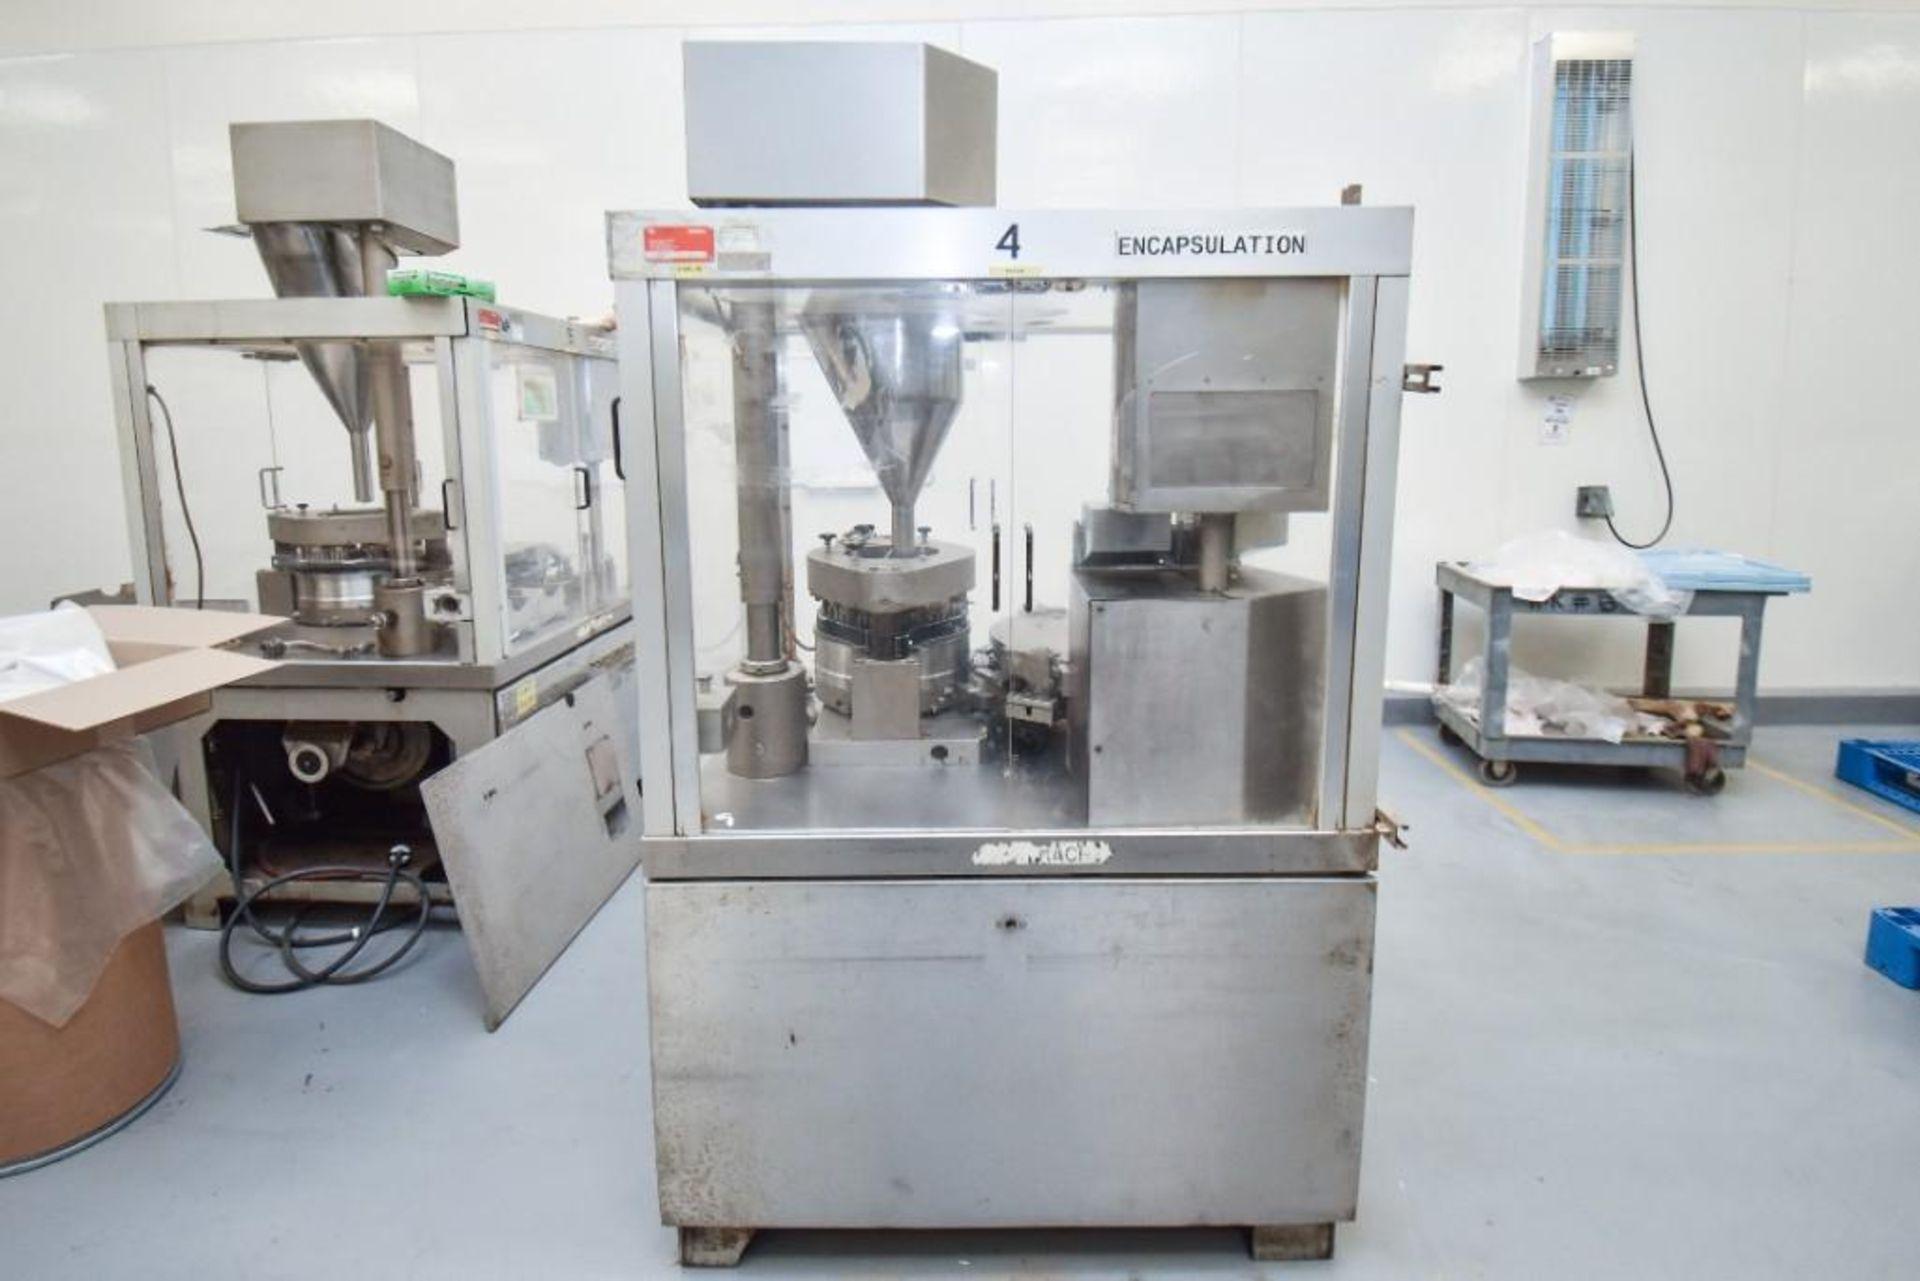 GFK 1500 Bosch Encapsulation Machine - Image 8 of 11